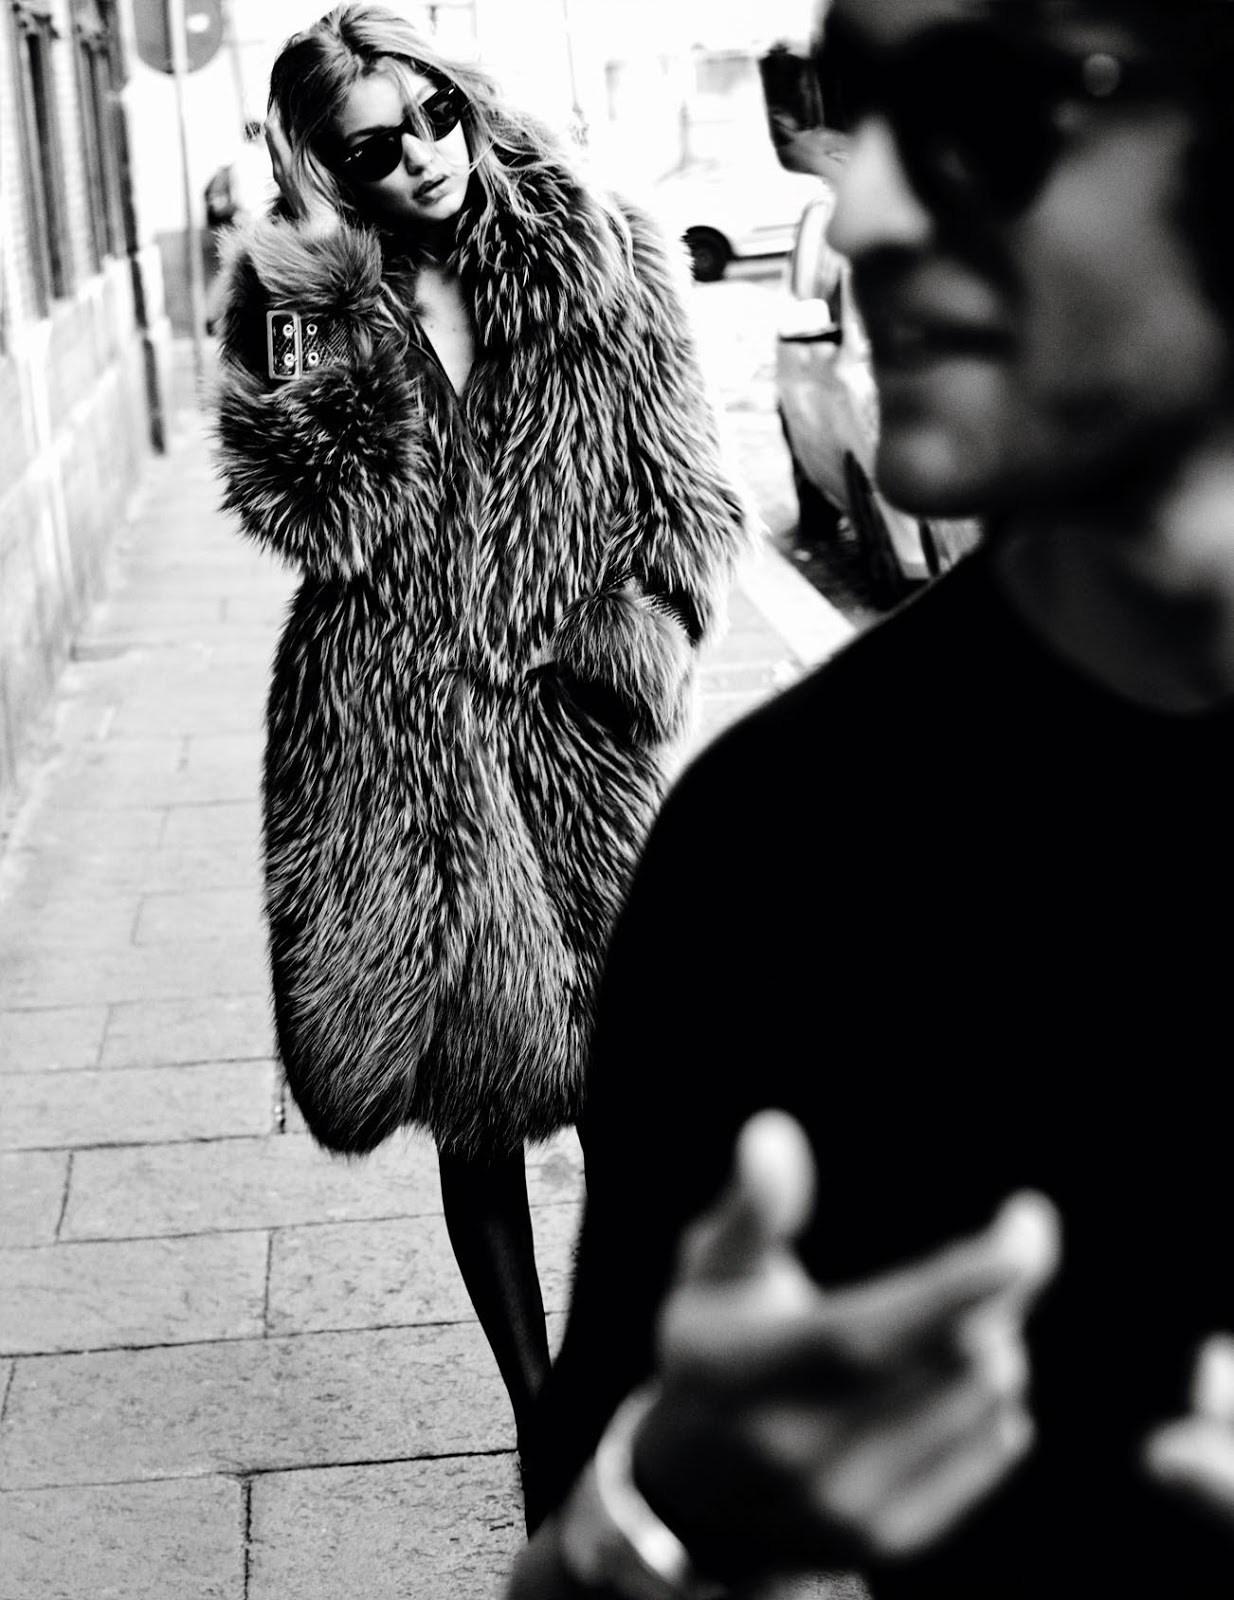 Gigi-Hadid-by-Mario-Testino-for-Vogue-Paris-November-2016